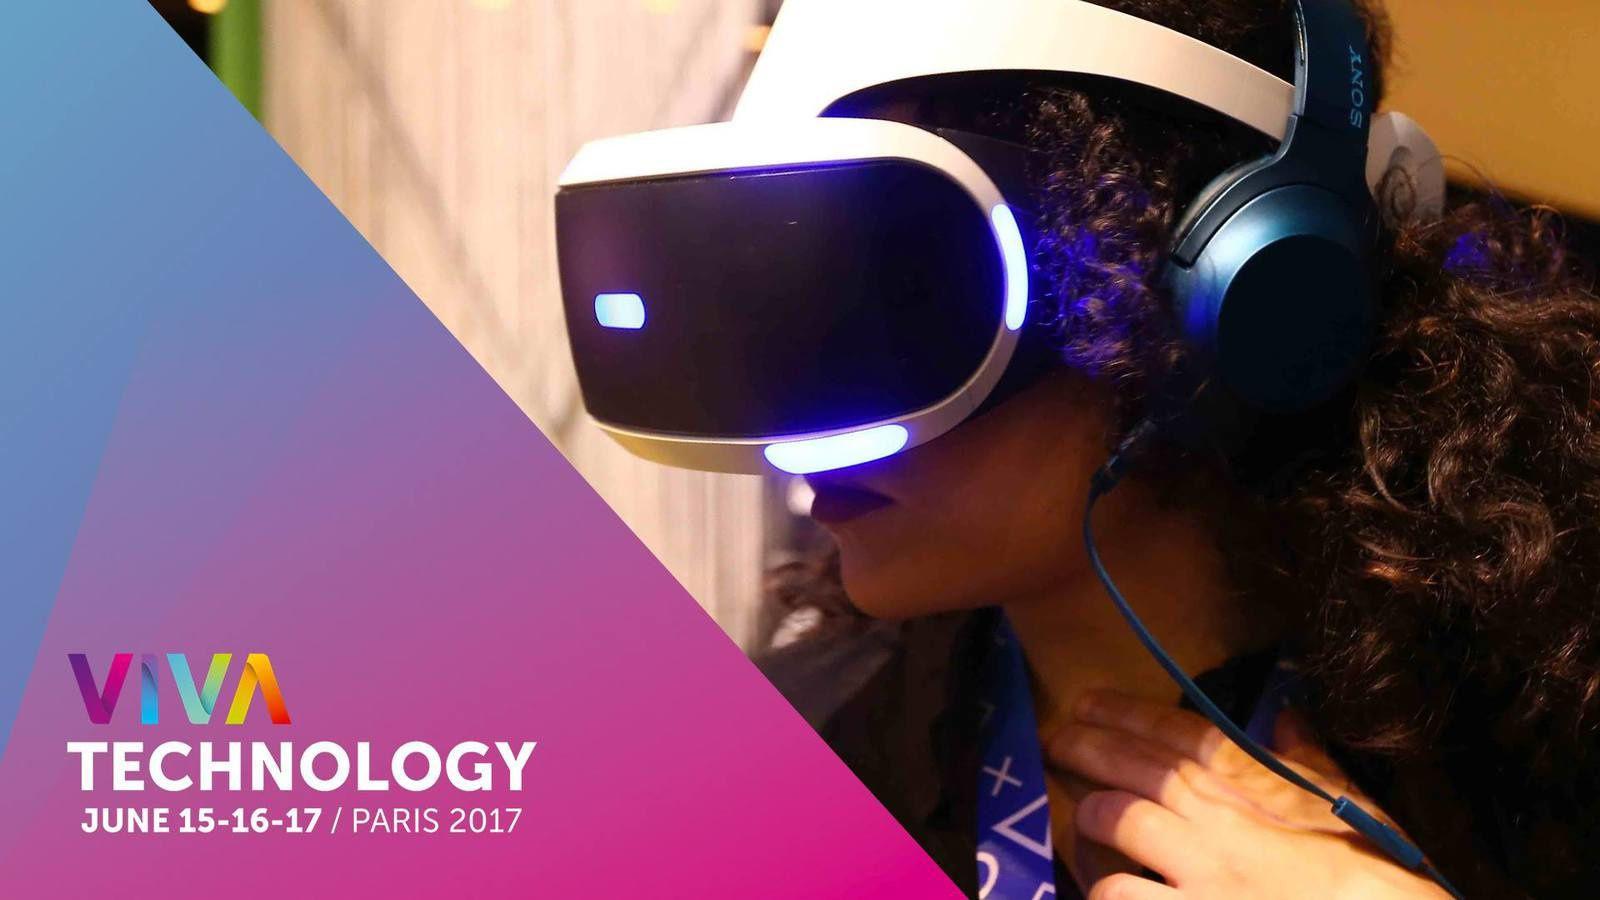 Viva Technology 2017